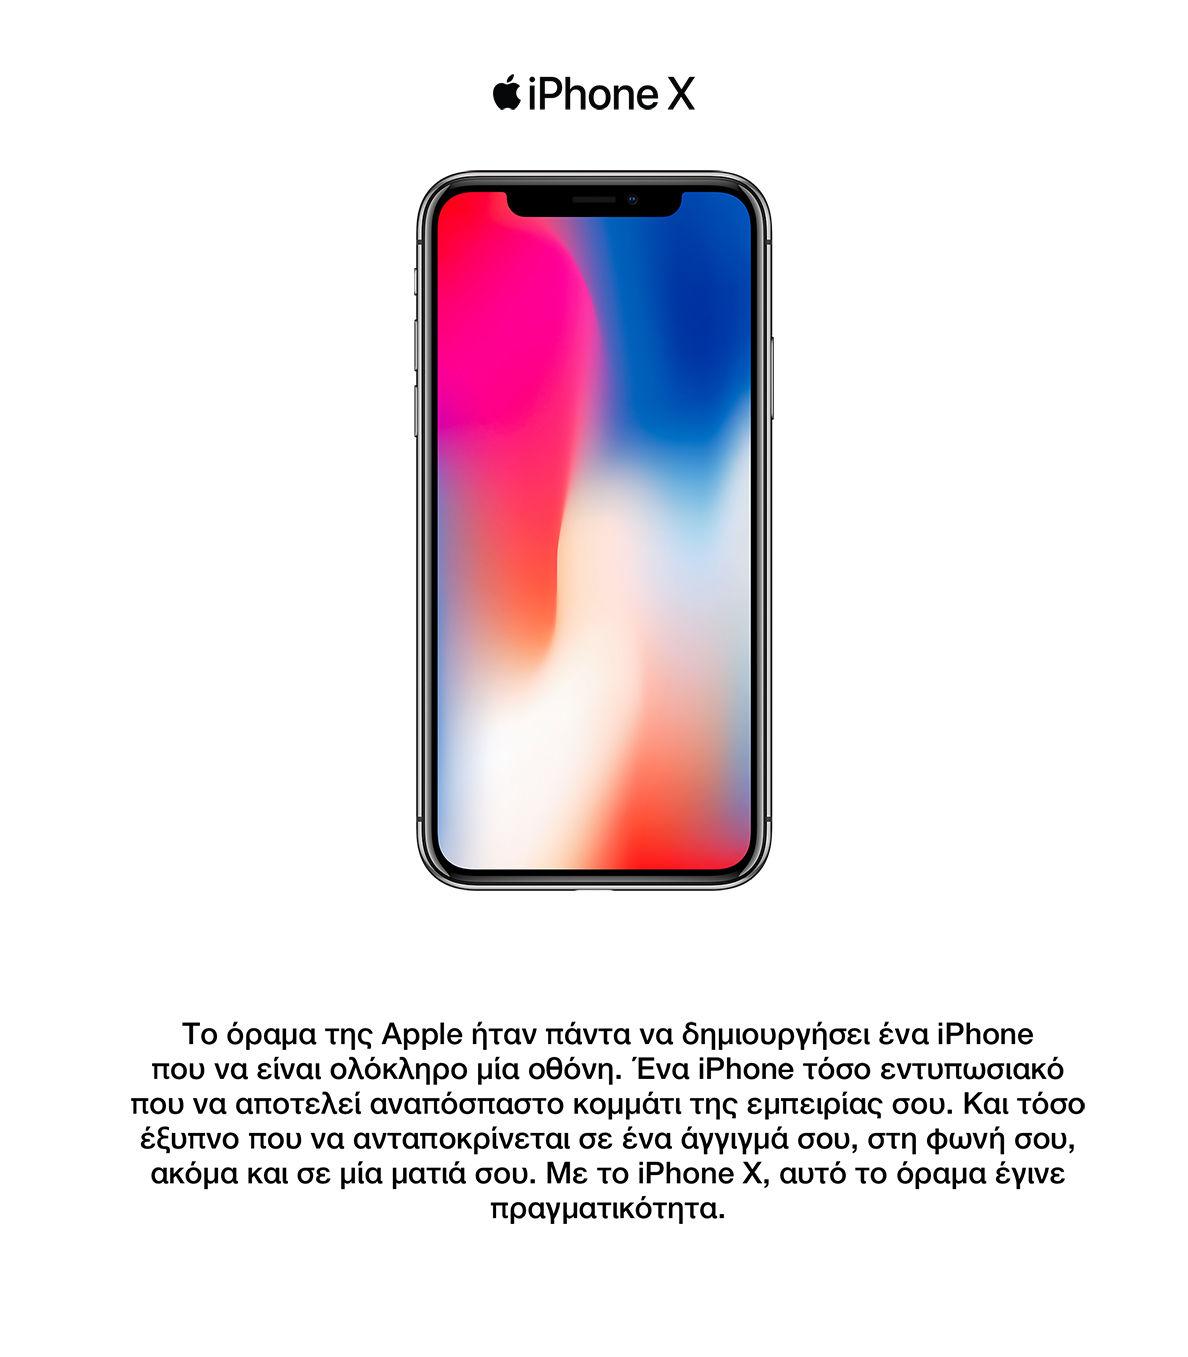 iPhonex-agora-Ellada-Mediamarkt-public-kotsovolos-germanos-iPhoneX-diathesimo-gia-paraggelia-november-2017 (2)